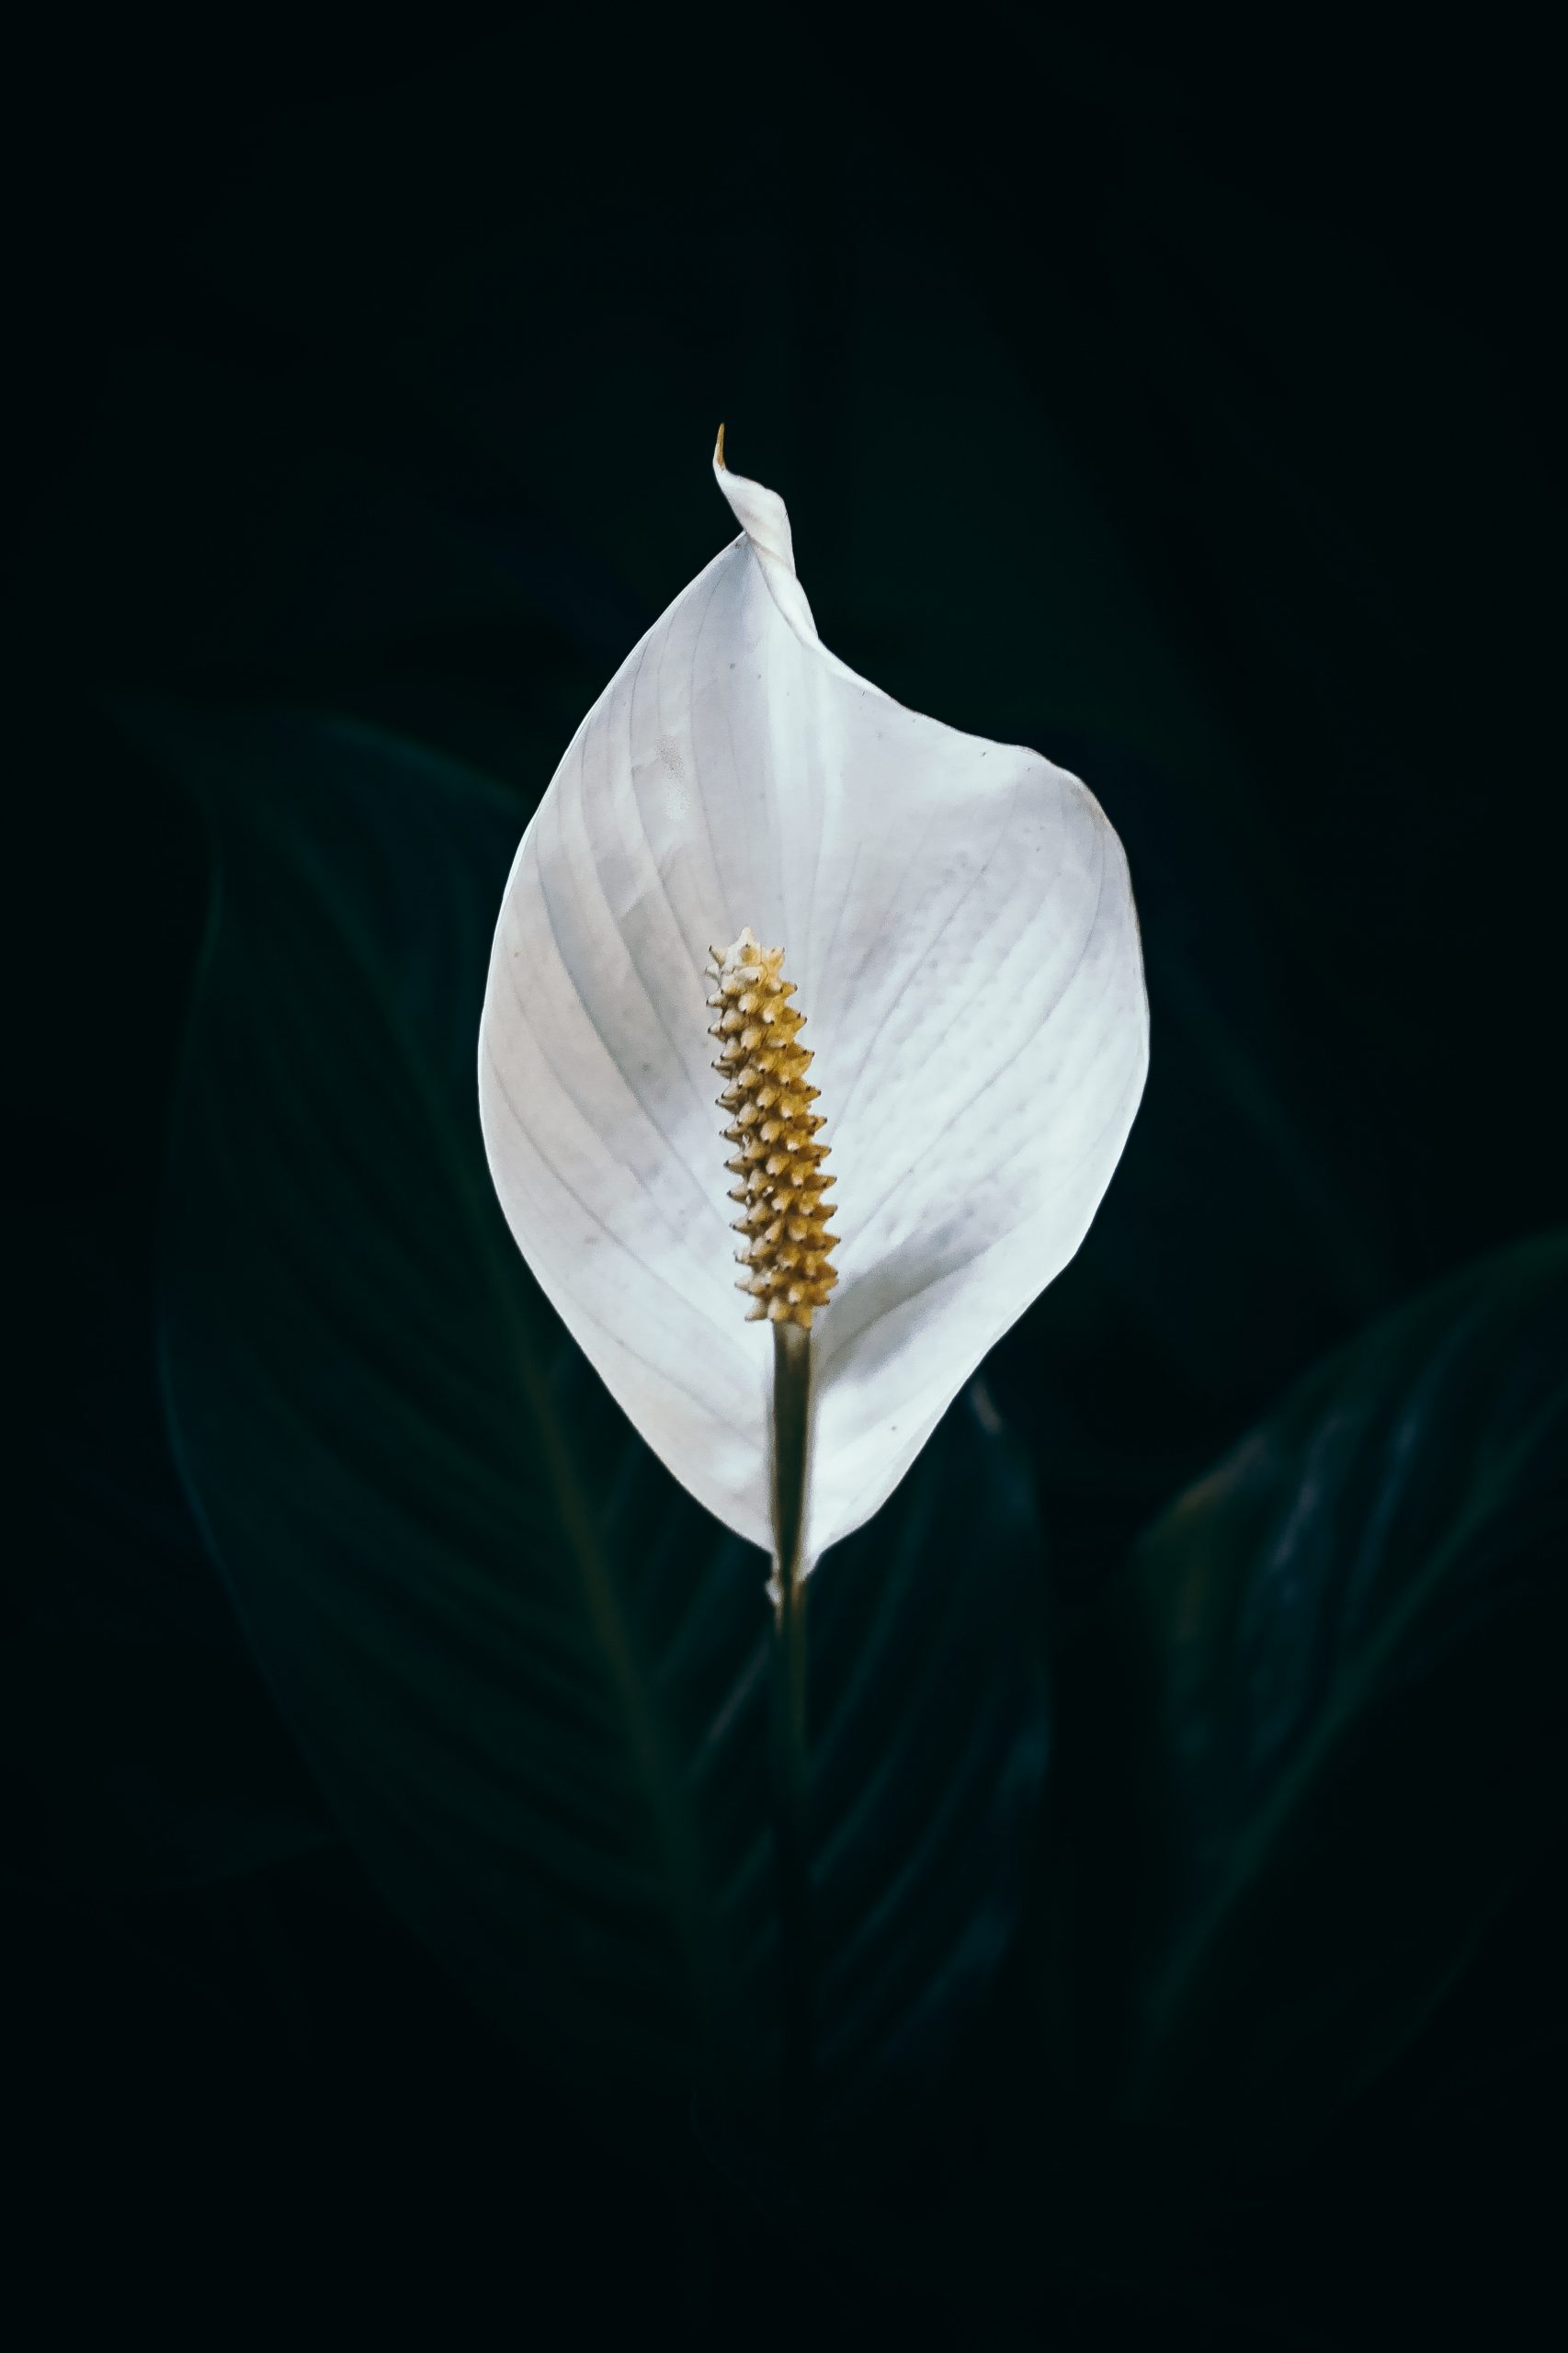 Spatophyllum